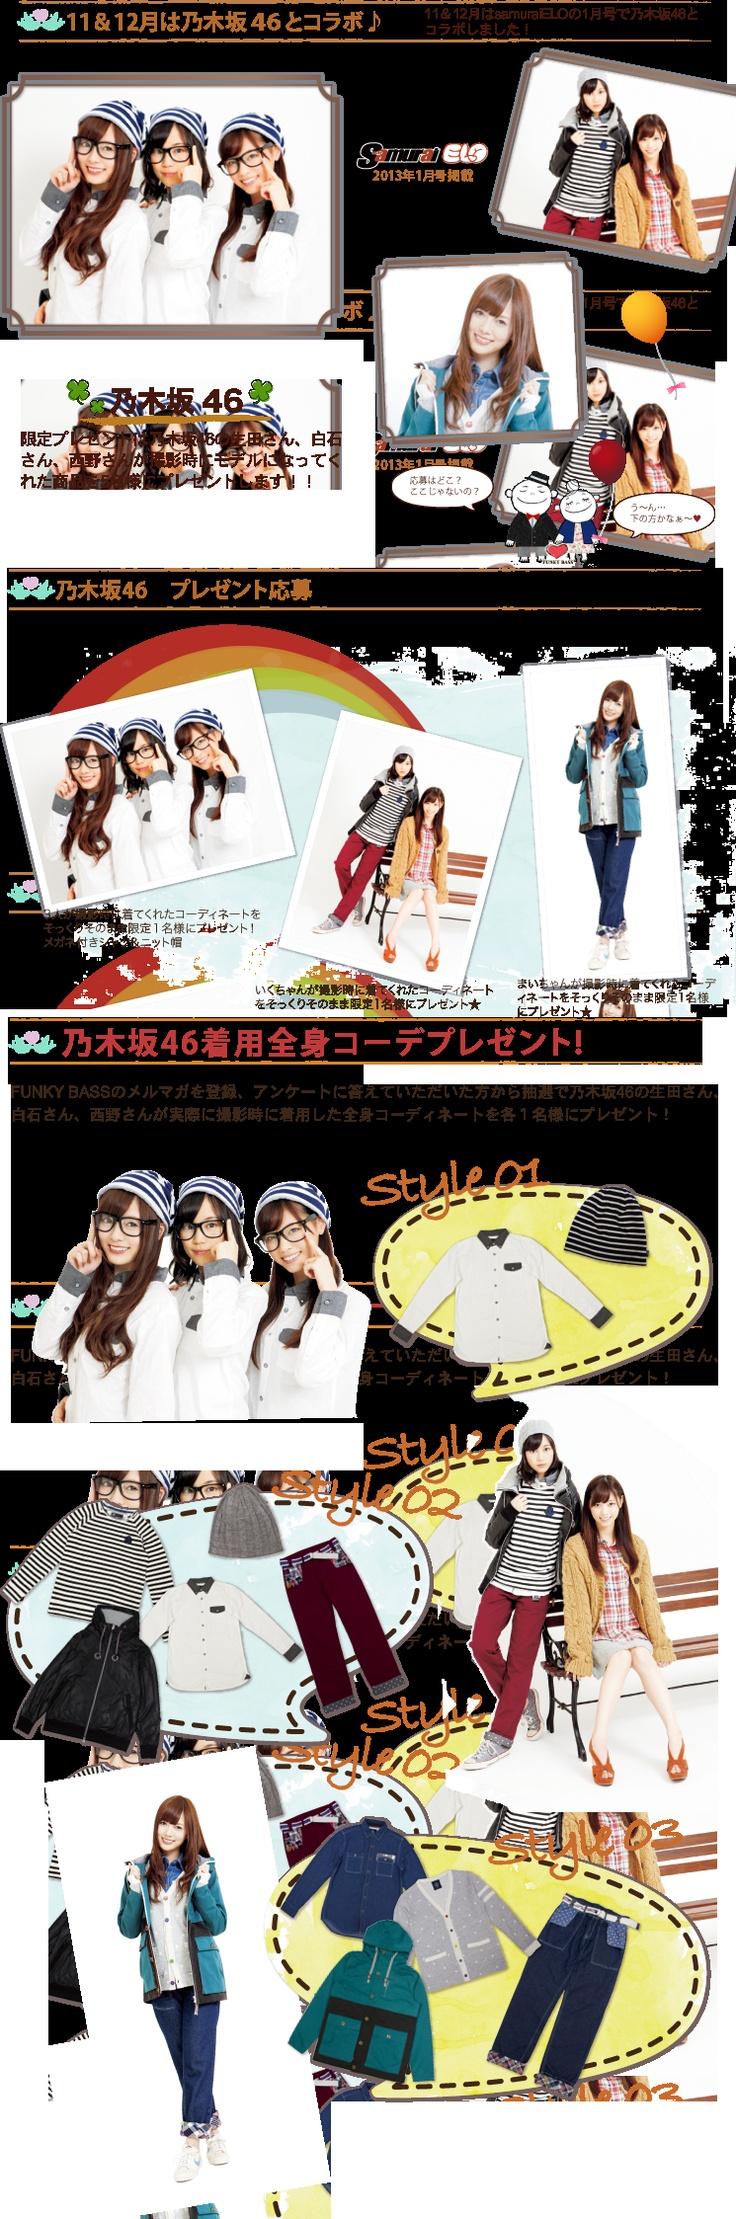 乃木坂46 (nogizaka46) Matsumura Sayuri (松村 沙友理)  Shiraishi Mai (白石 麻衣)  Nishino Nanase (西野 七瀬)  Ikoma Rina (生駒 里奈)  Ikuta Erika (生田 絵梨花)  will appear on SAMURAI ELO December Issue ~ http://funkybass.jp/sample_site/ ~ http://funkybass.jp/sample_site/?page_id=199